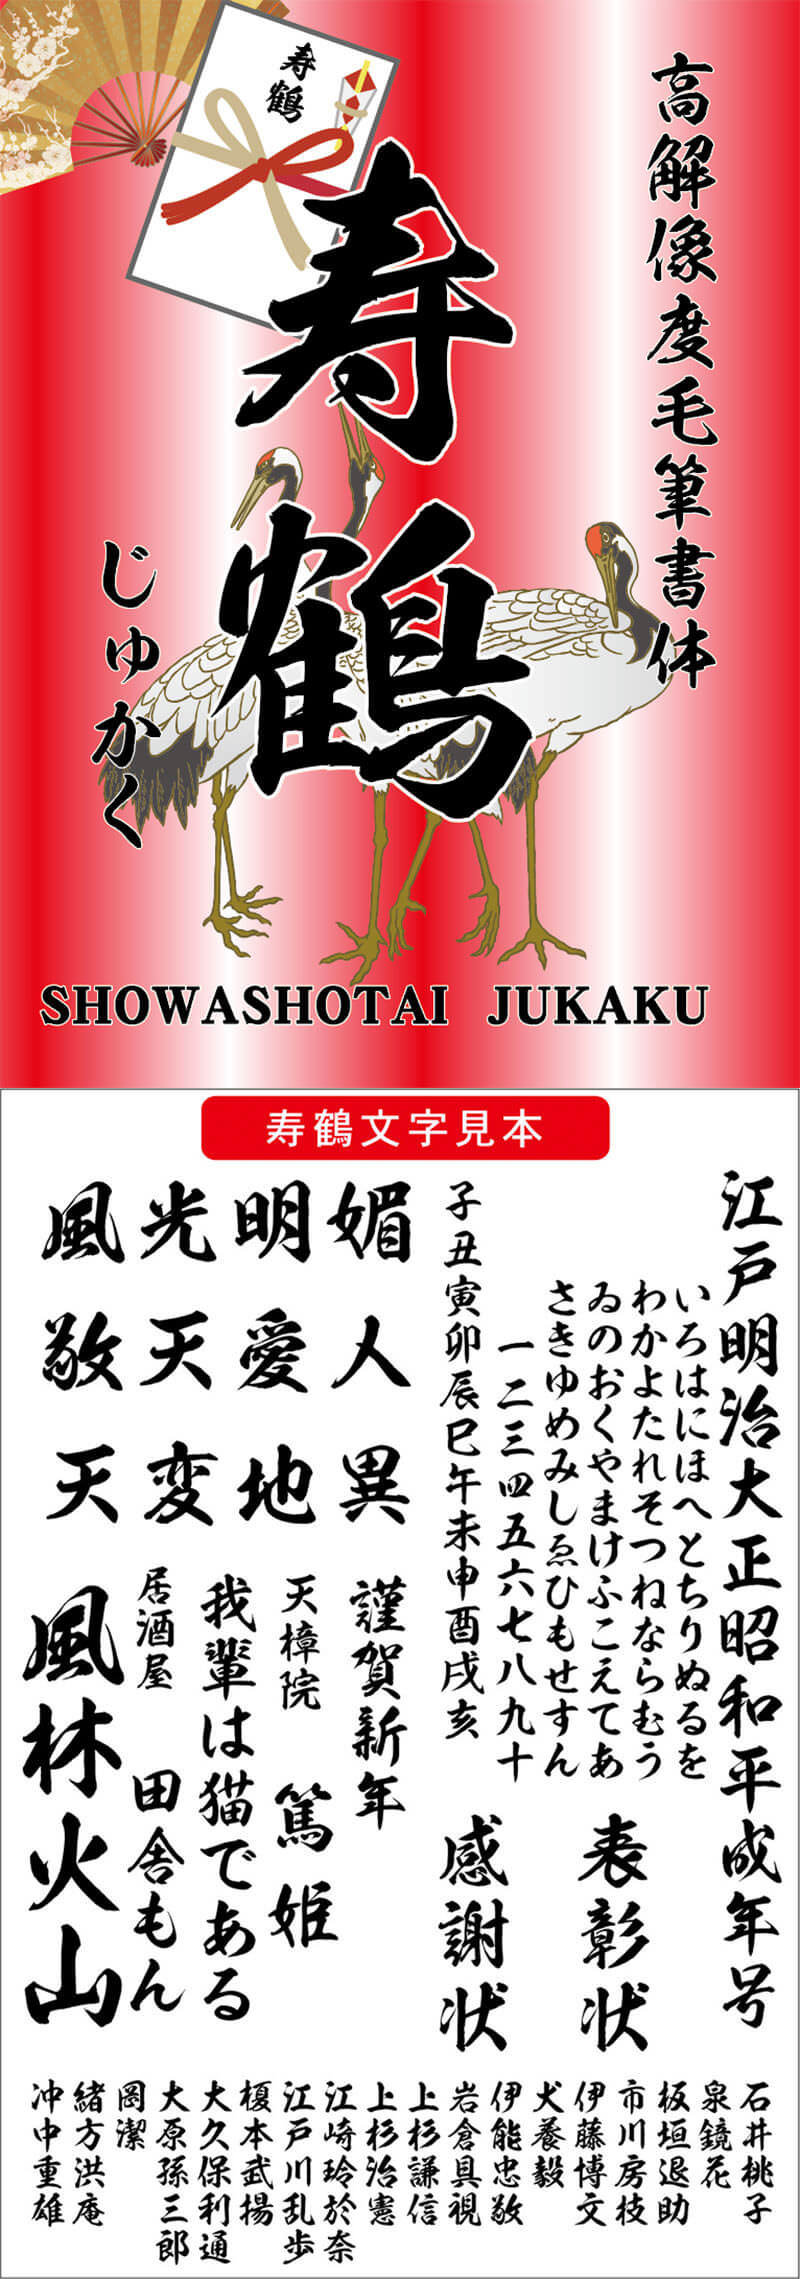 jyukaku-new